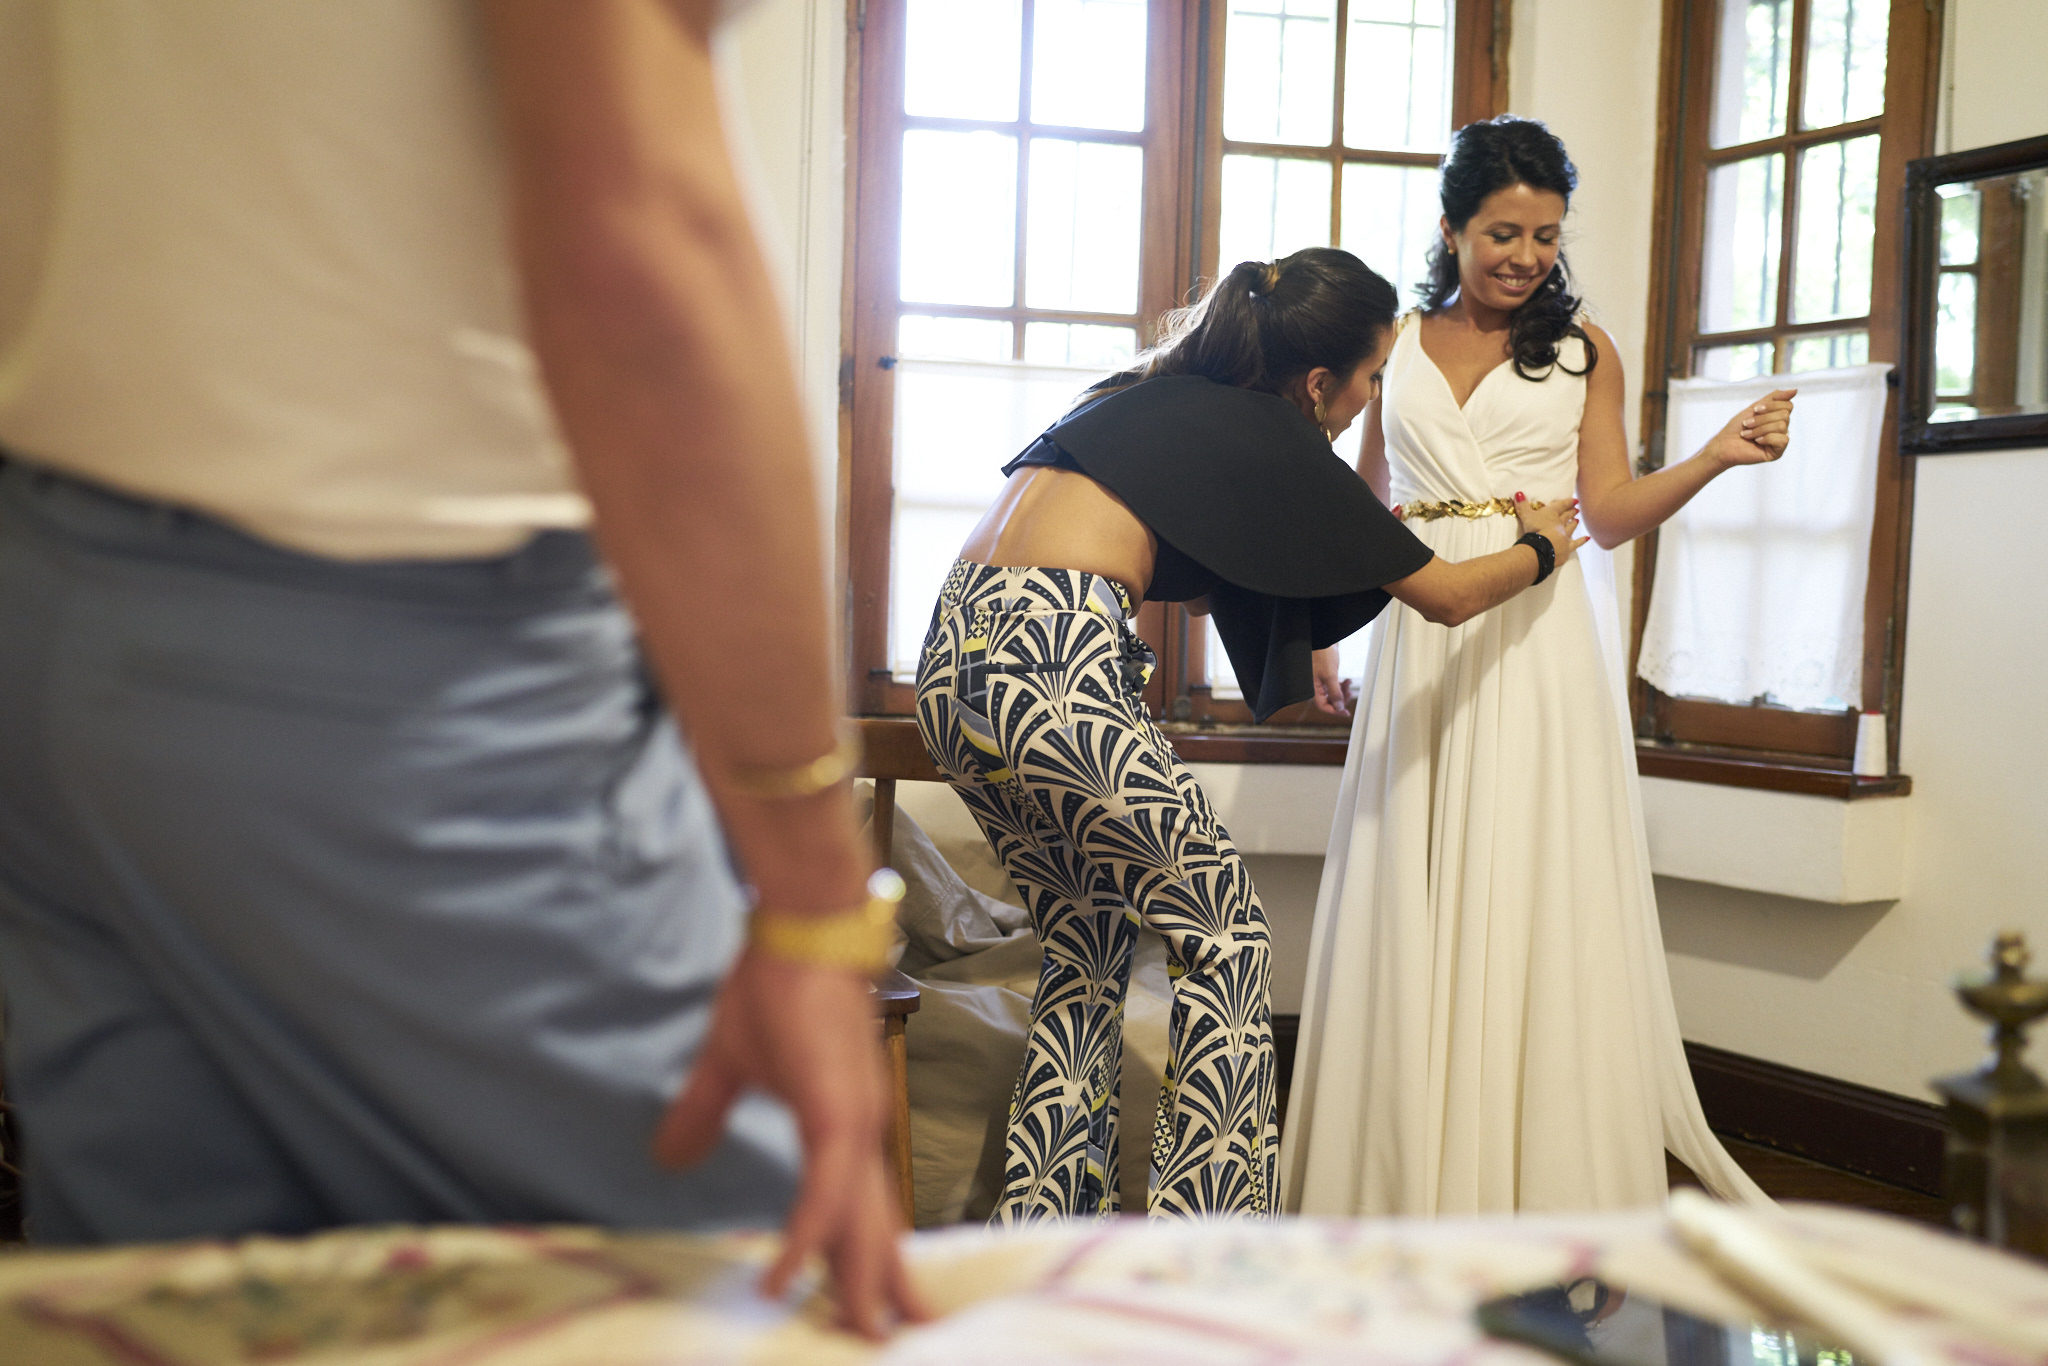 Fotografo de Casamientos - Bodas en Tucson - Cordoba DSC06162.jpg